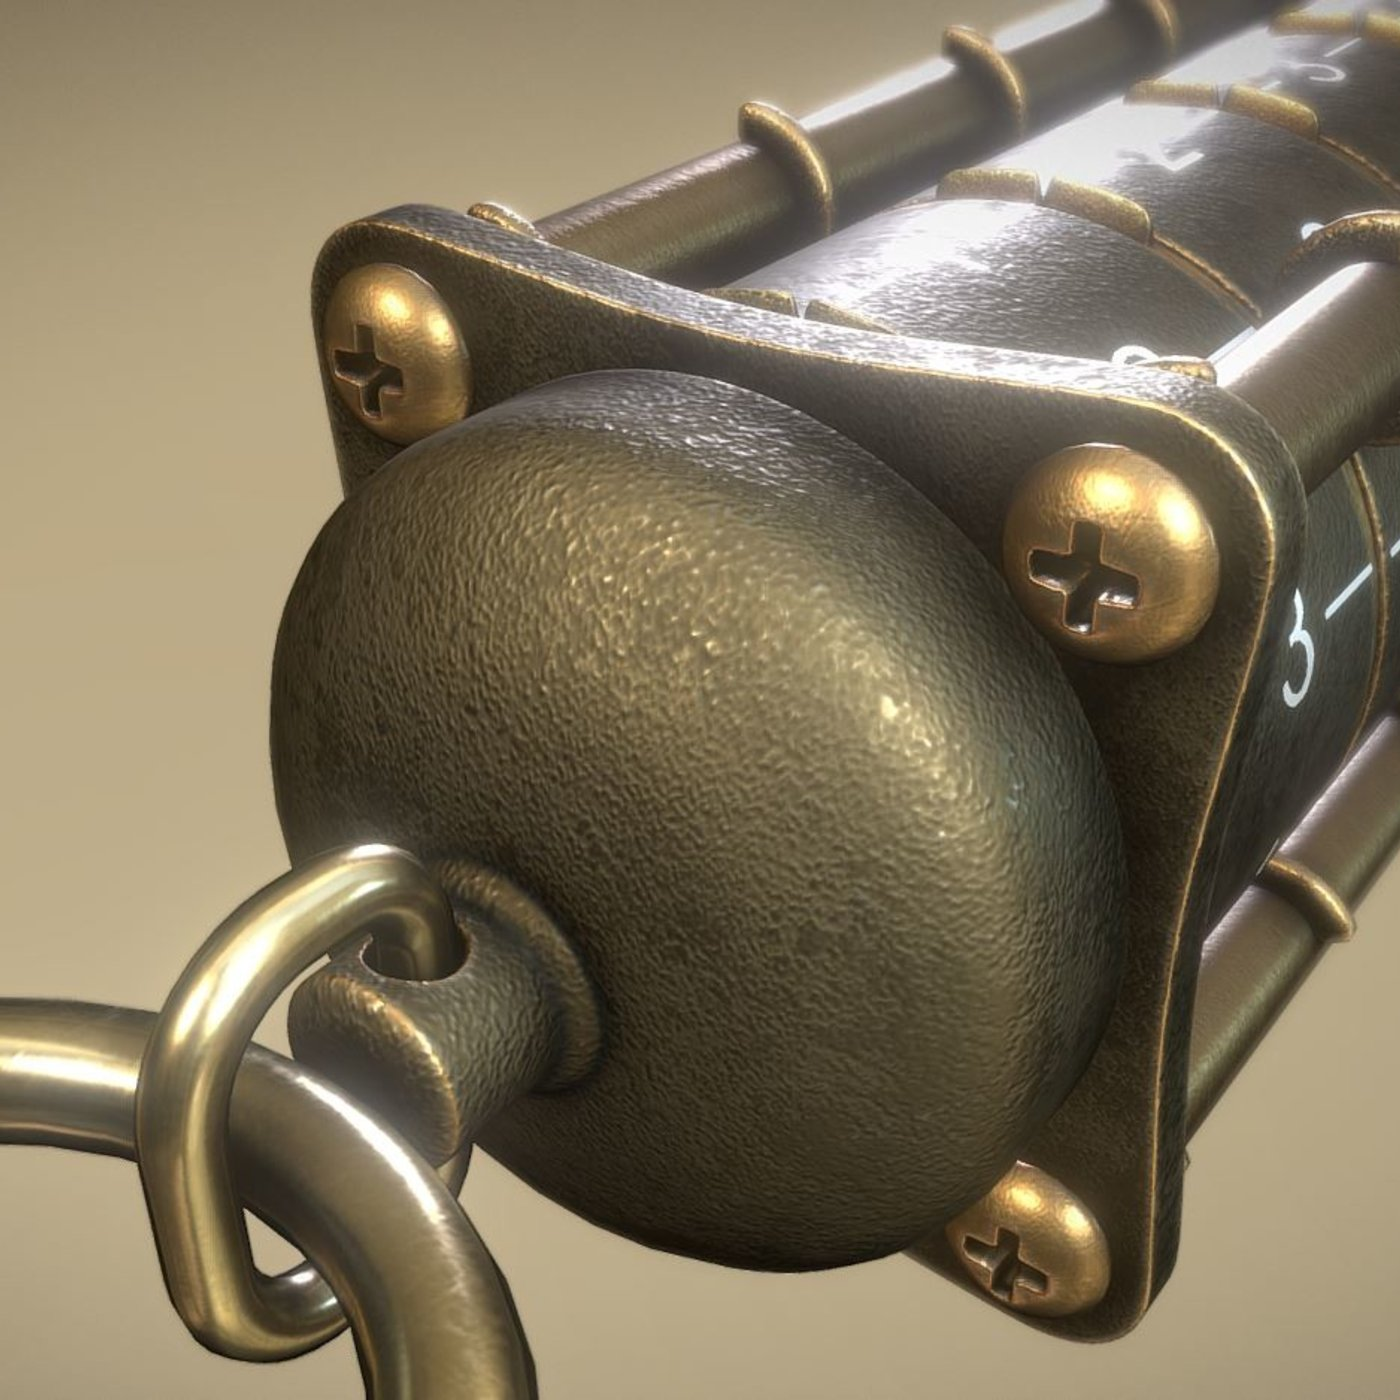 Cryptex USB-Stick (Rigged)